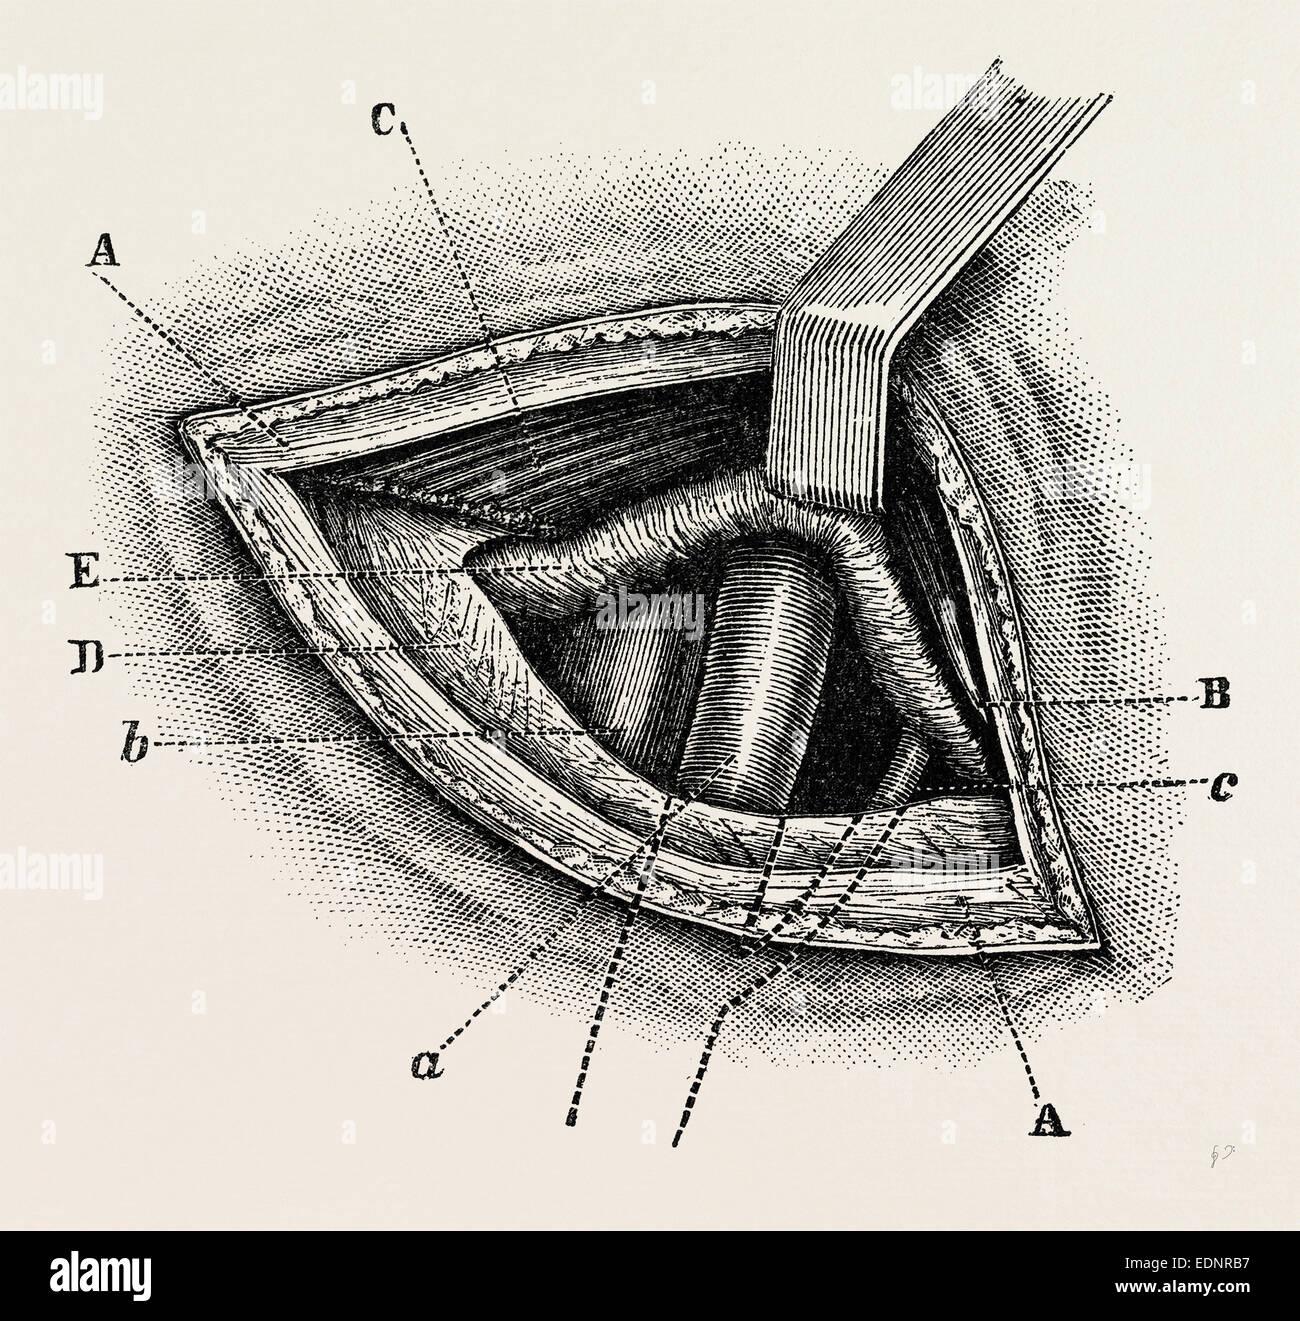 external iliac artery Stock Photos & external iliac artery Stock ...